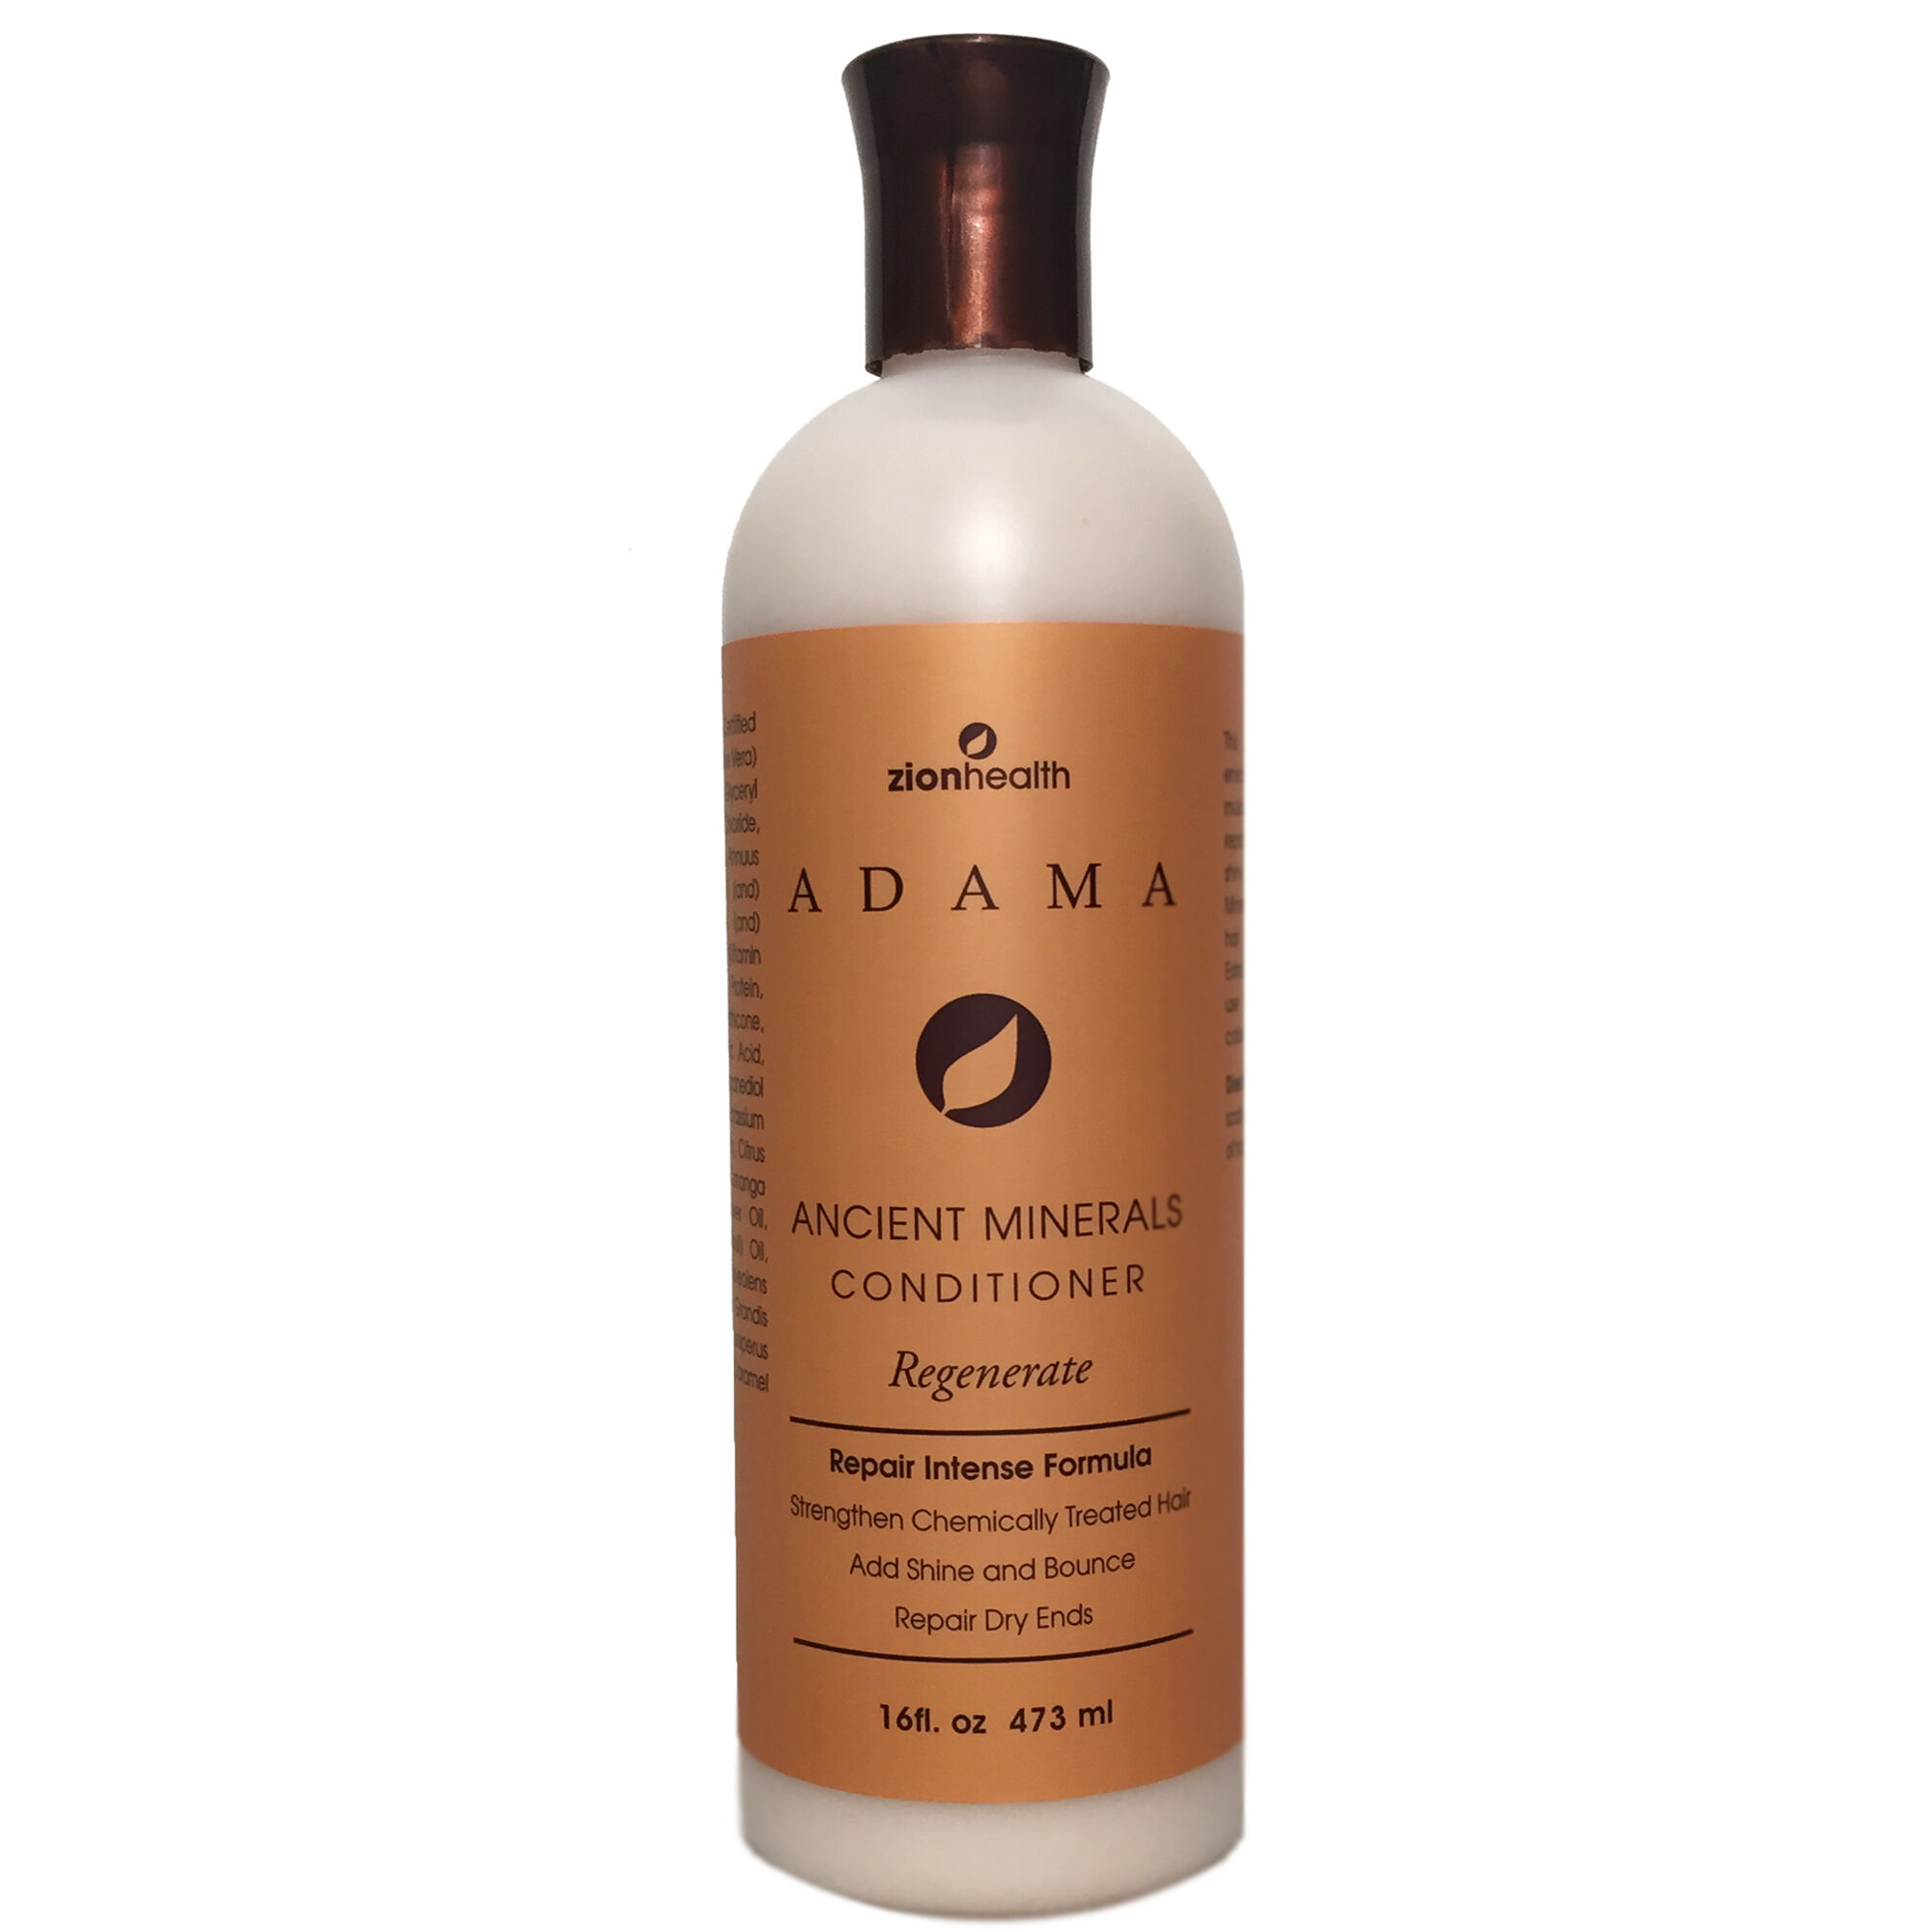 Ancient Minerals Conditioner Geranium Rose 16 Oz(s) Zion Health Shampoo & Conditioner